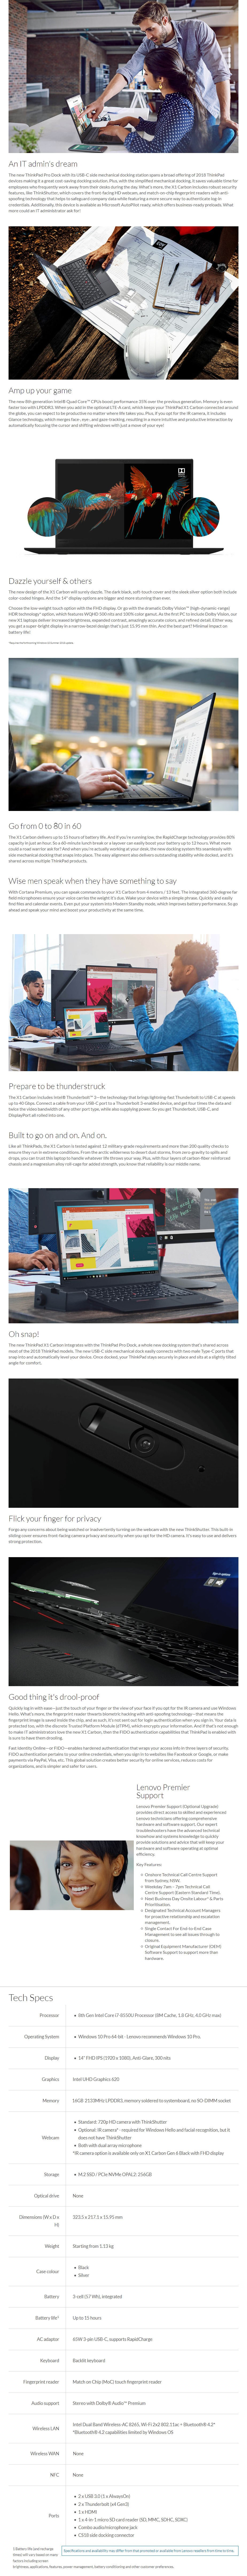 "Lenovo ThinkPad X1 Carbon Gen 6 14"" Notebook i7-8550U 16GB 256GB SSD Win 10 Pro - Overview 1"